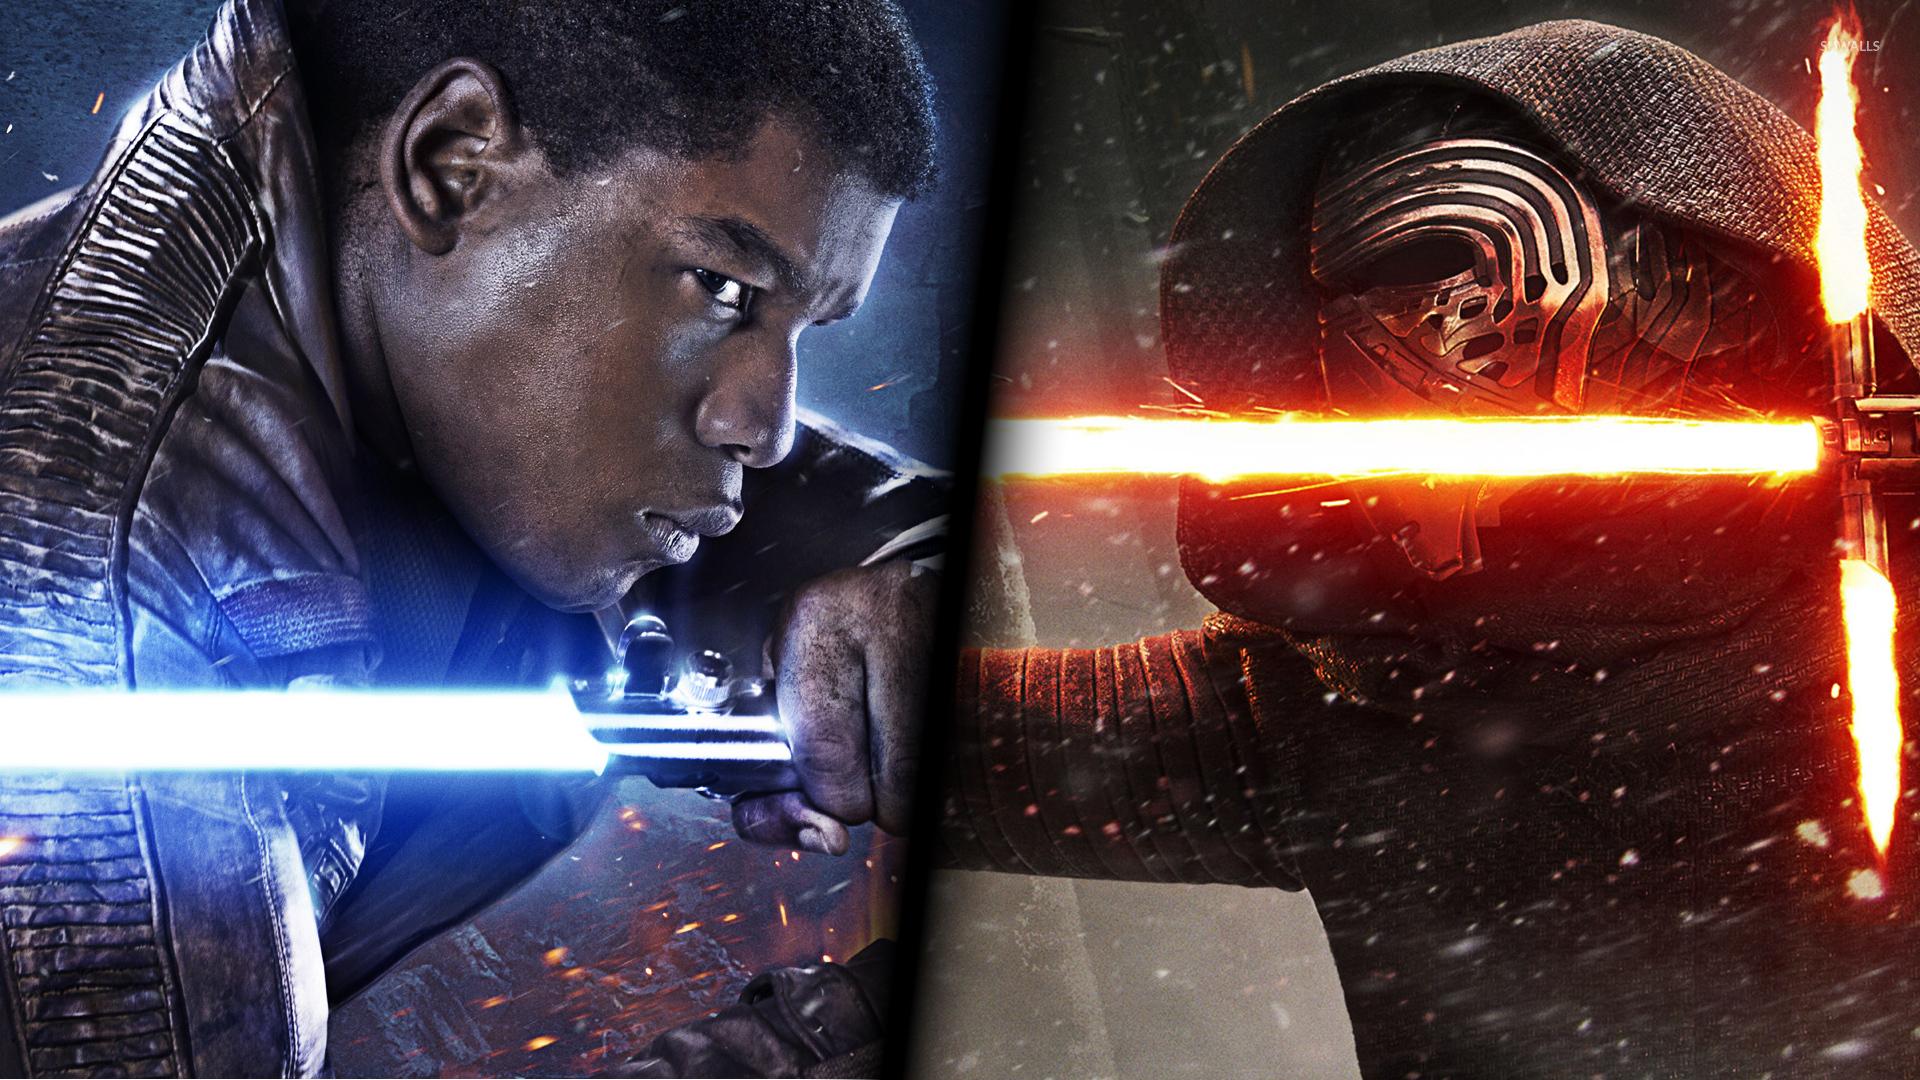 Finn Vs Kylo Ren In Star Wars The Force Awakens Wallpaper Movie Wallpapers 51508